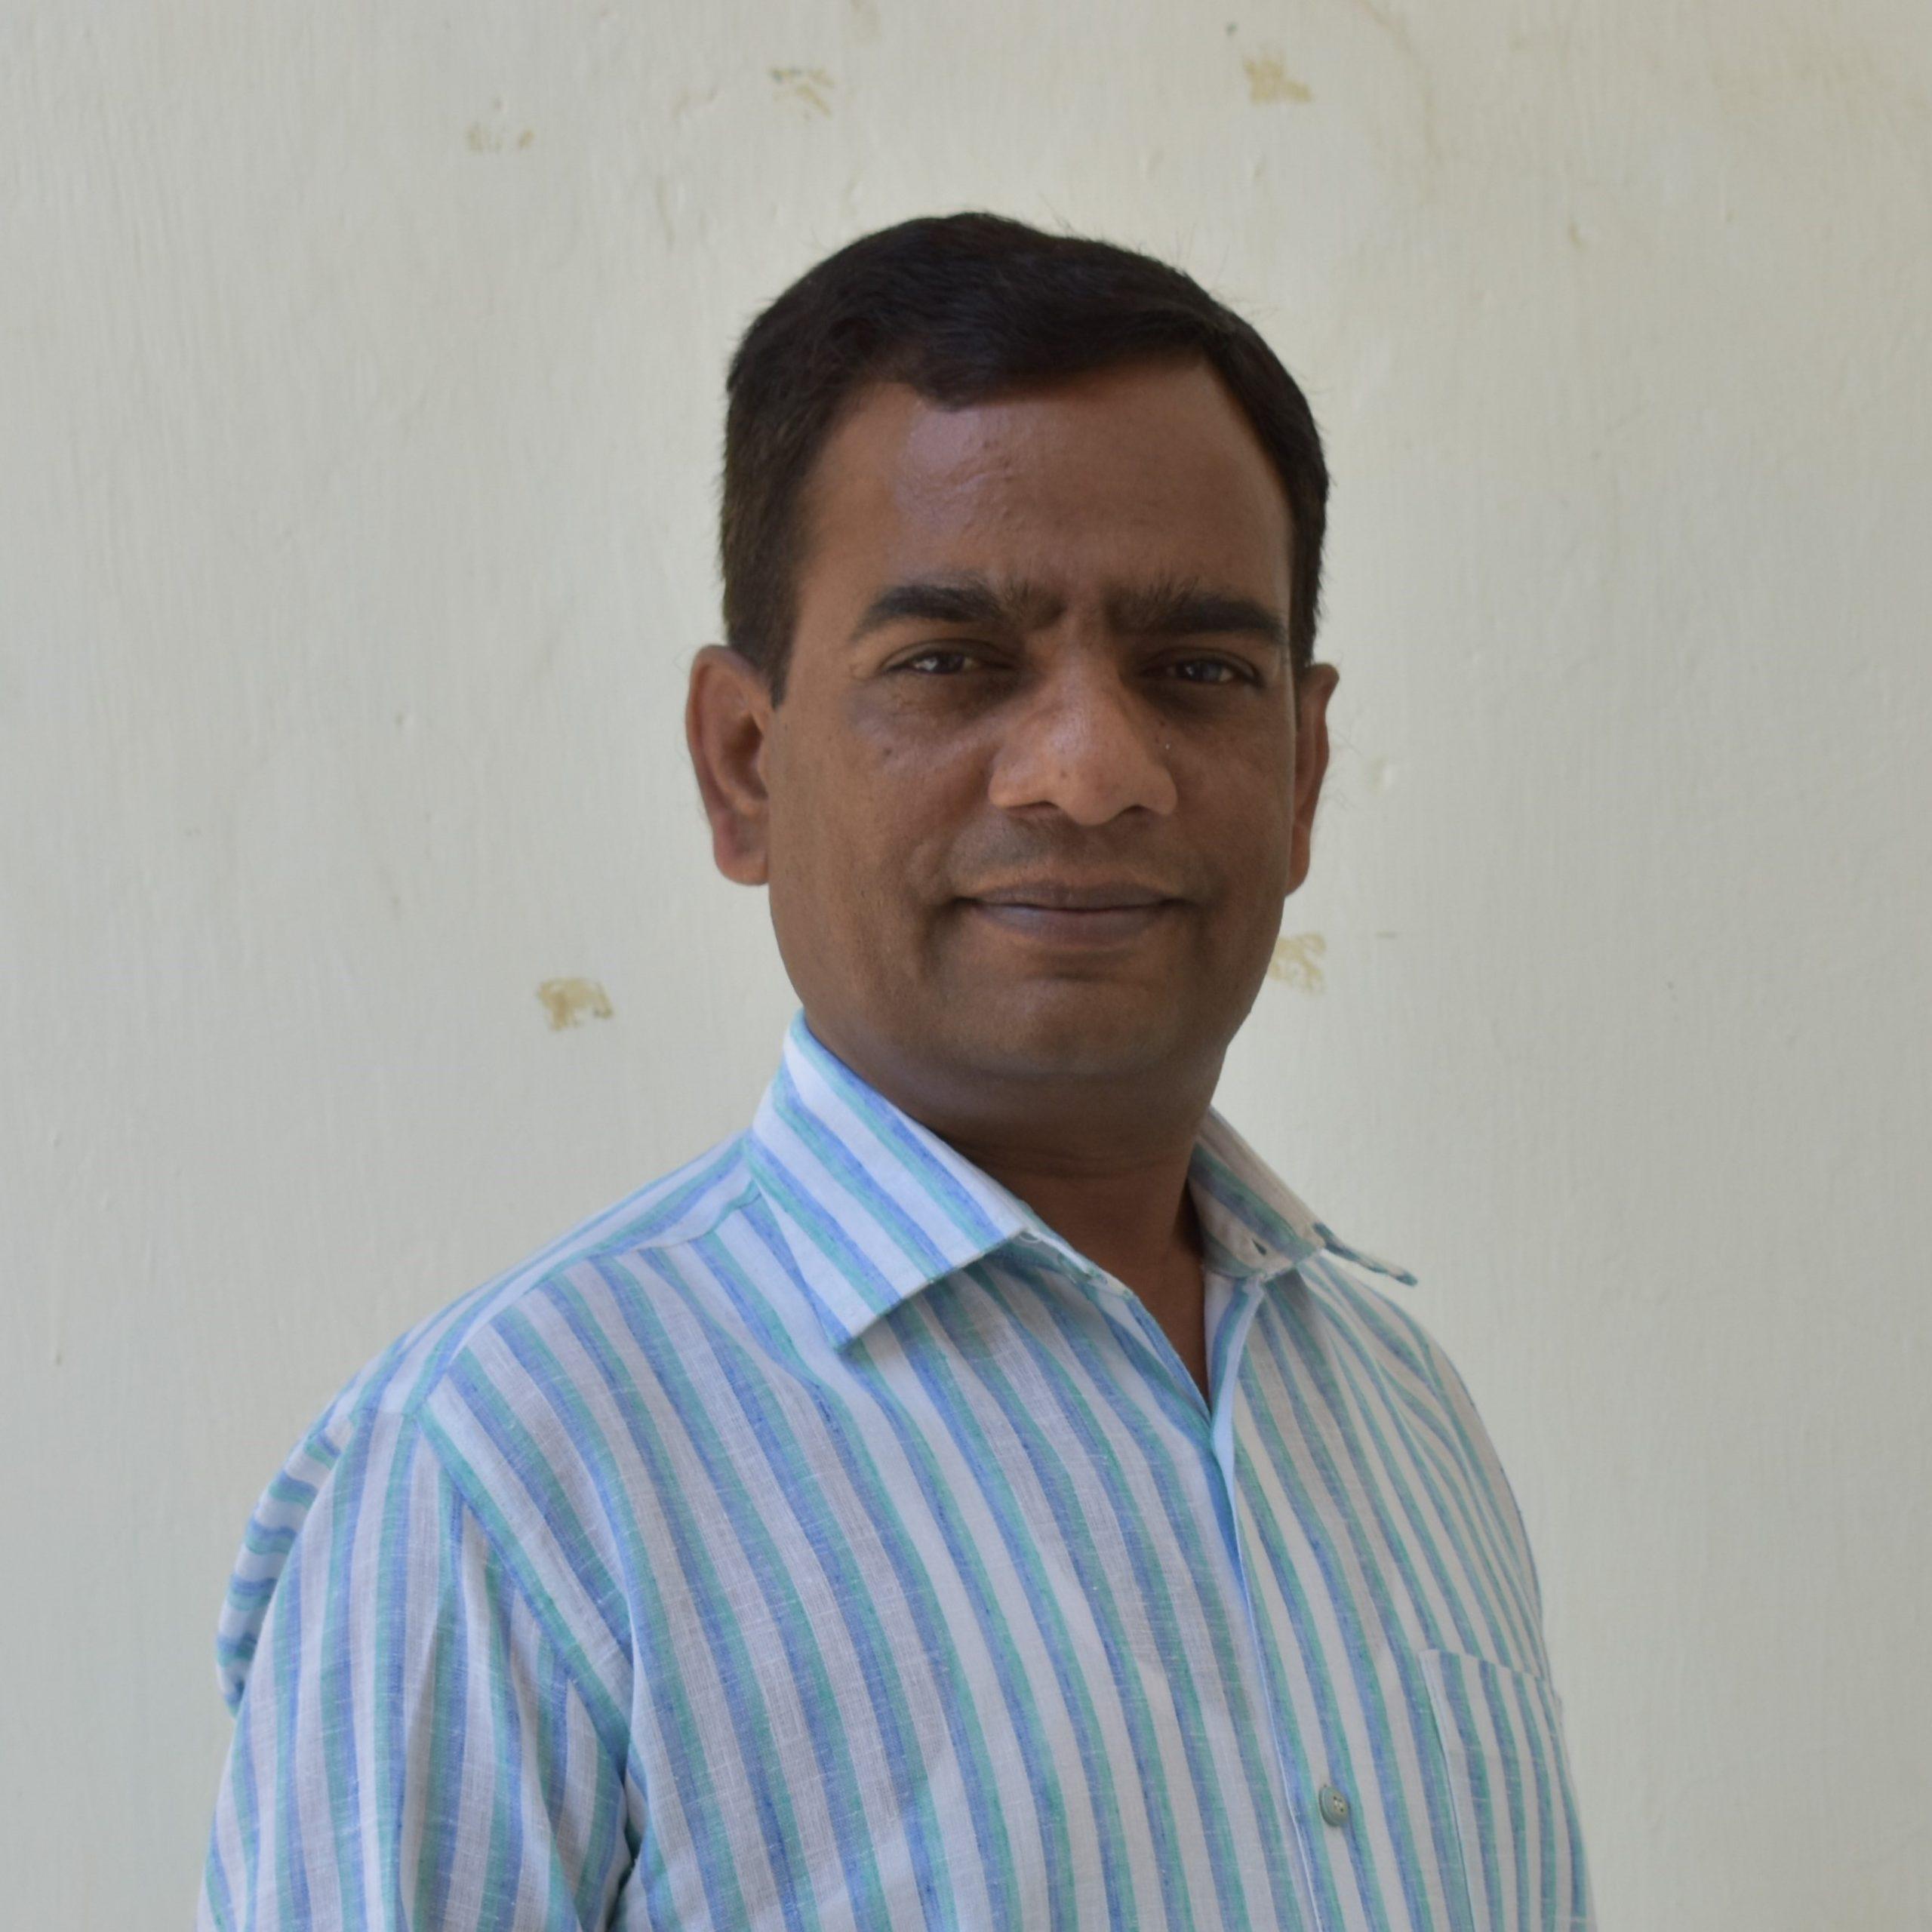 Mr. Jayeshkumar Amrutlal Patel